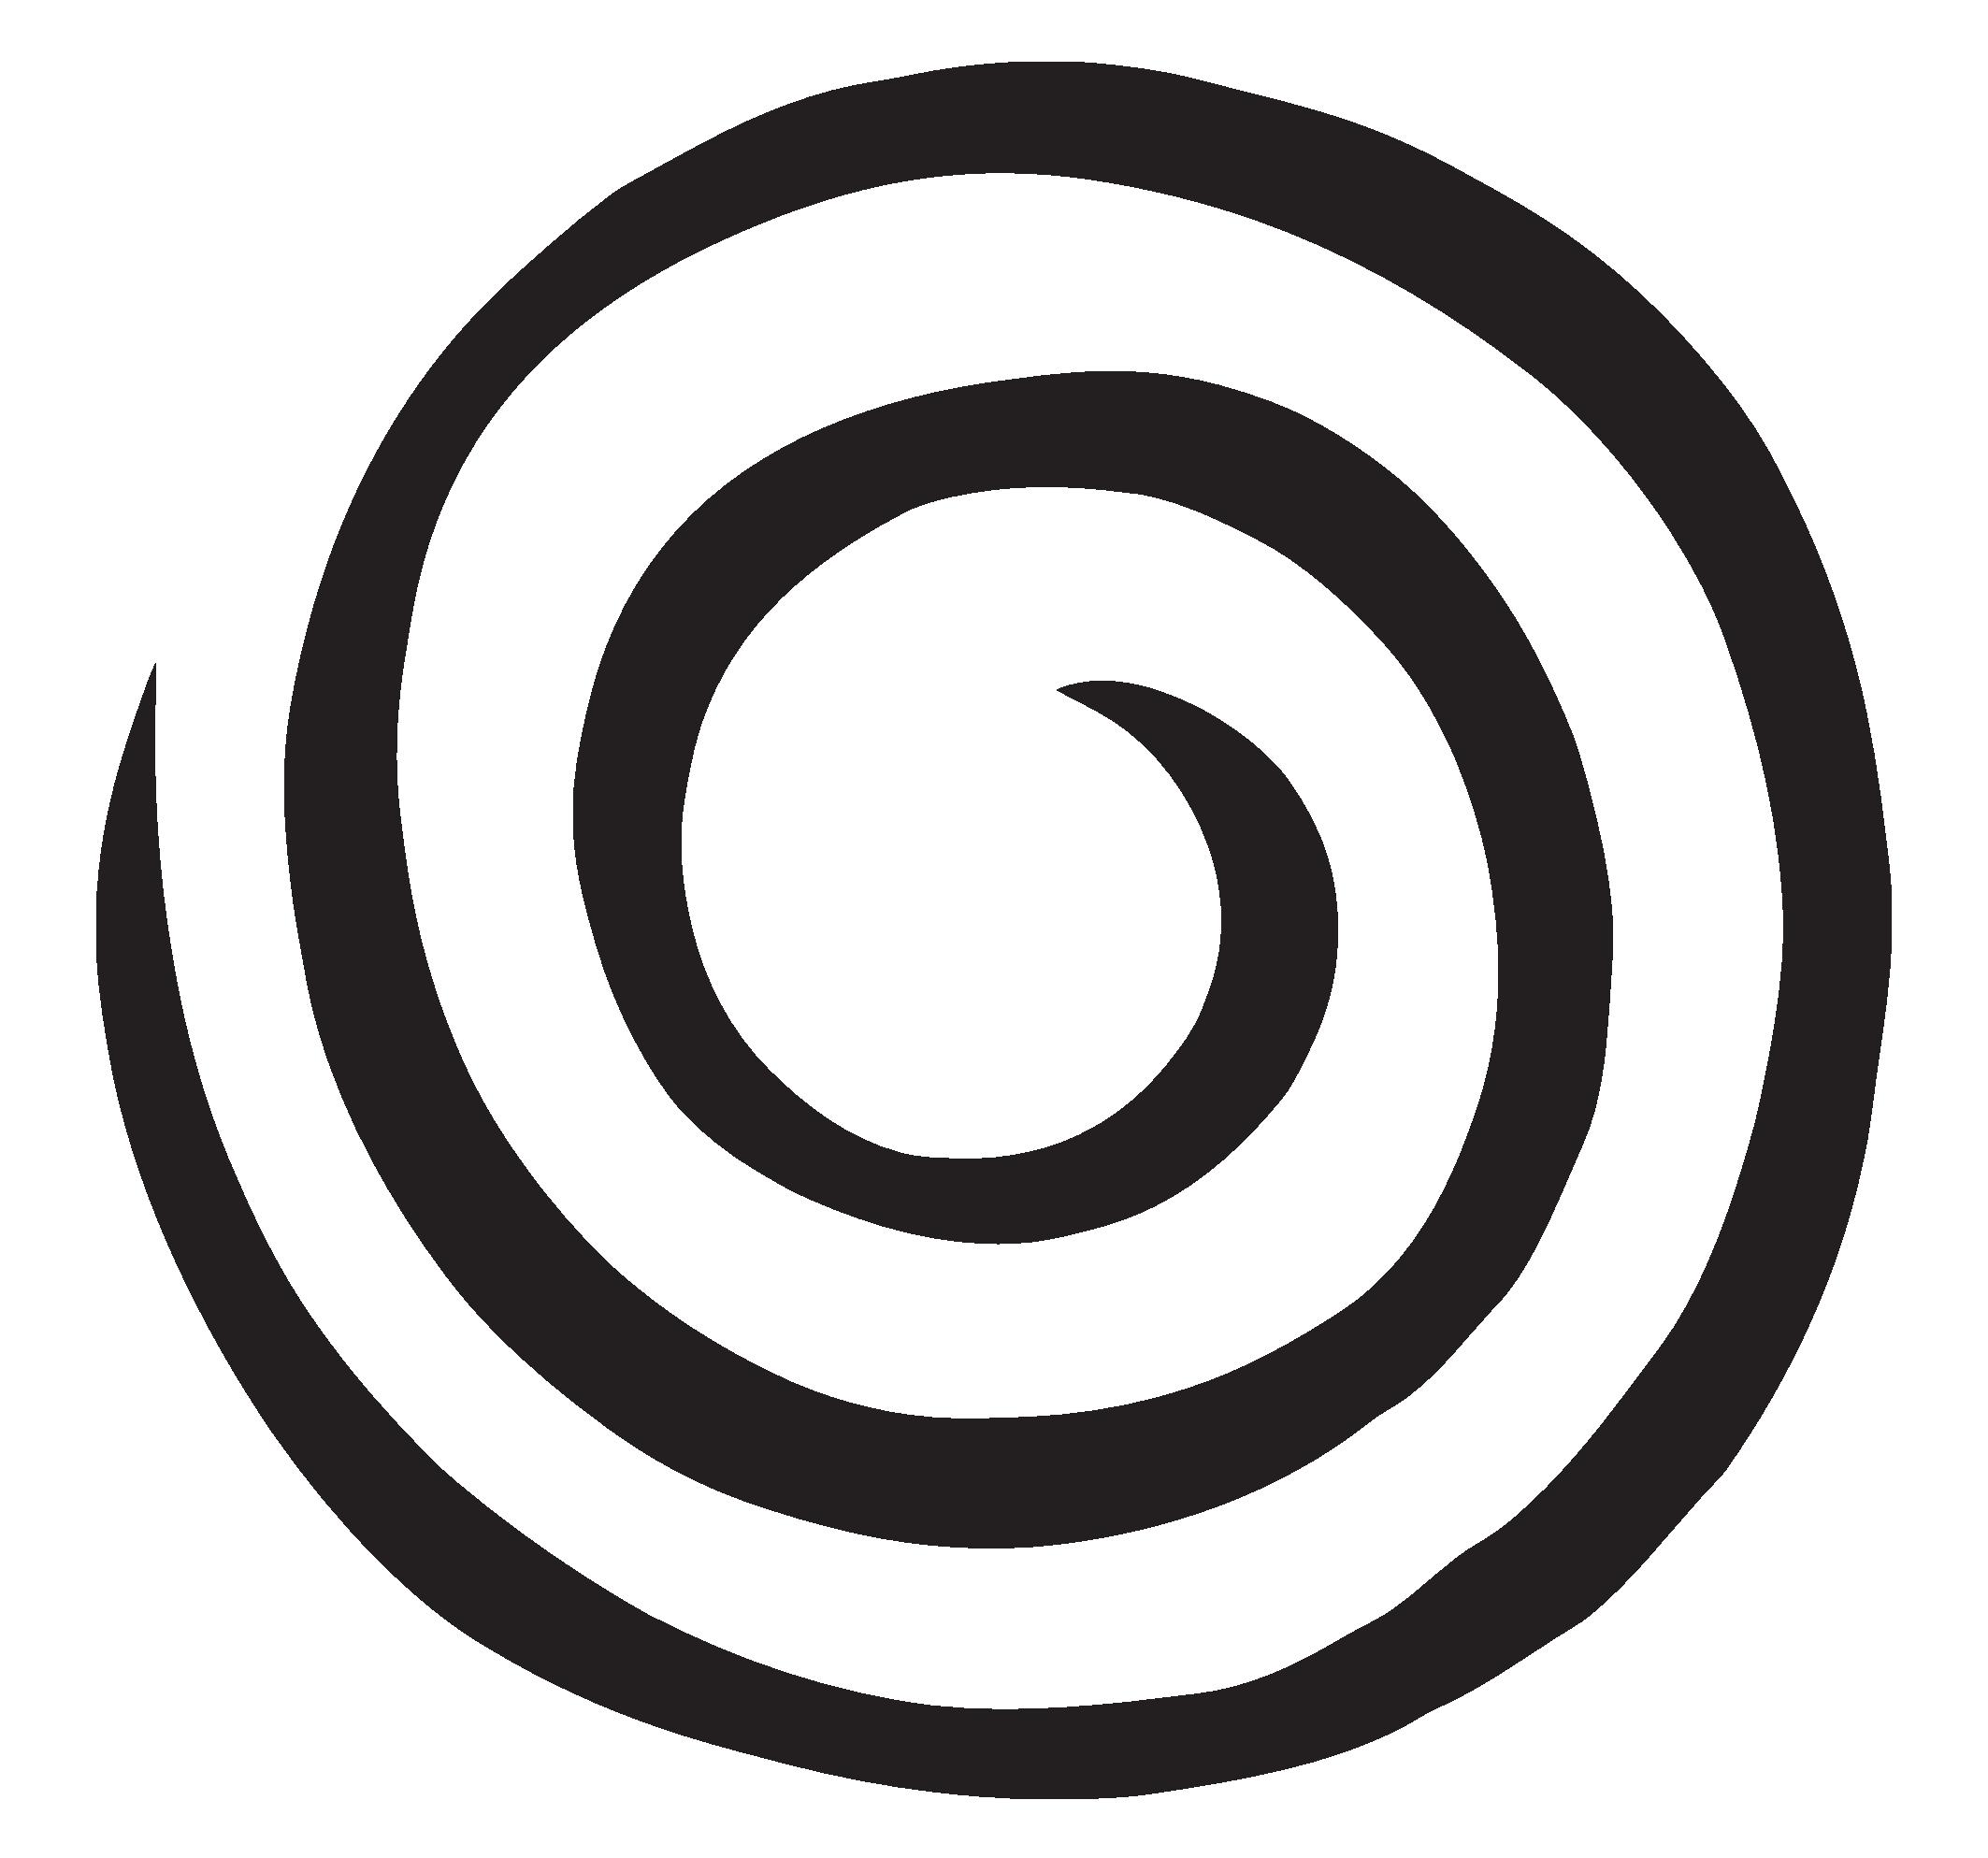 Png transparent image pngpix. Circle clipart swirl